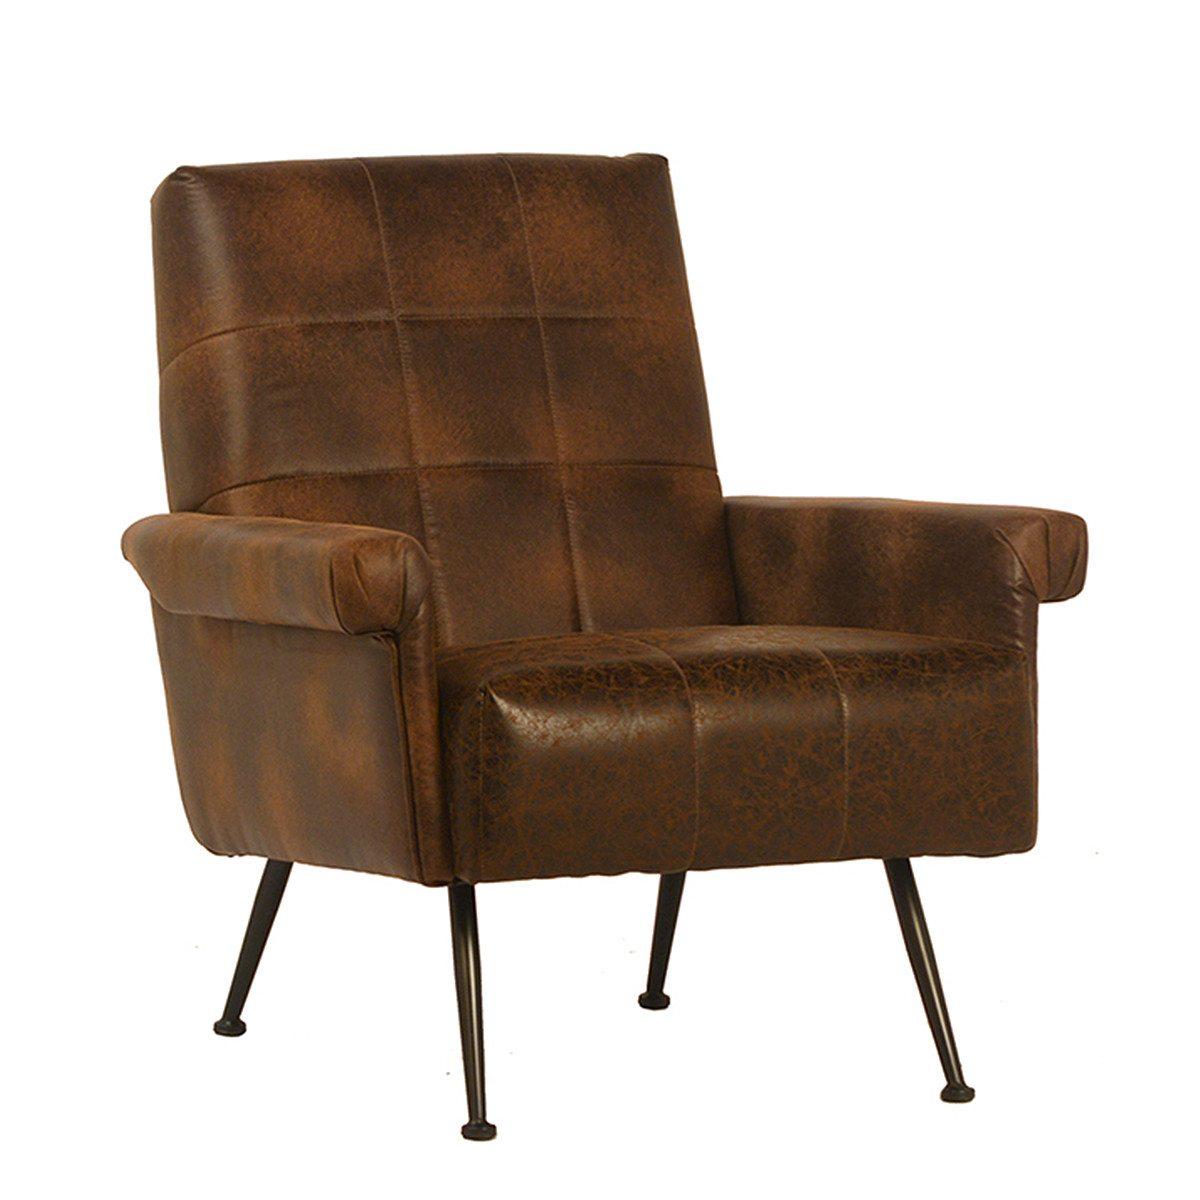 trafford-chair-shopceladon